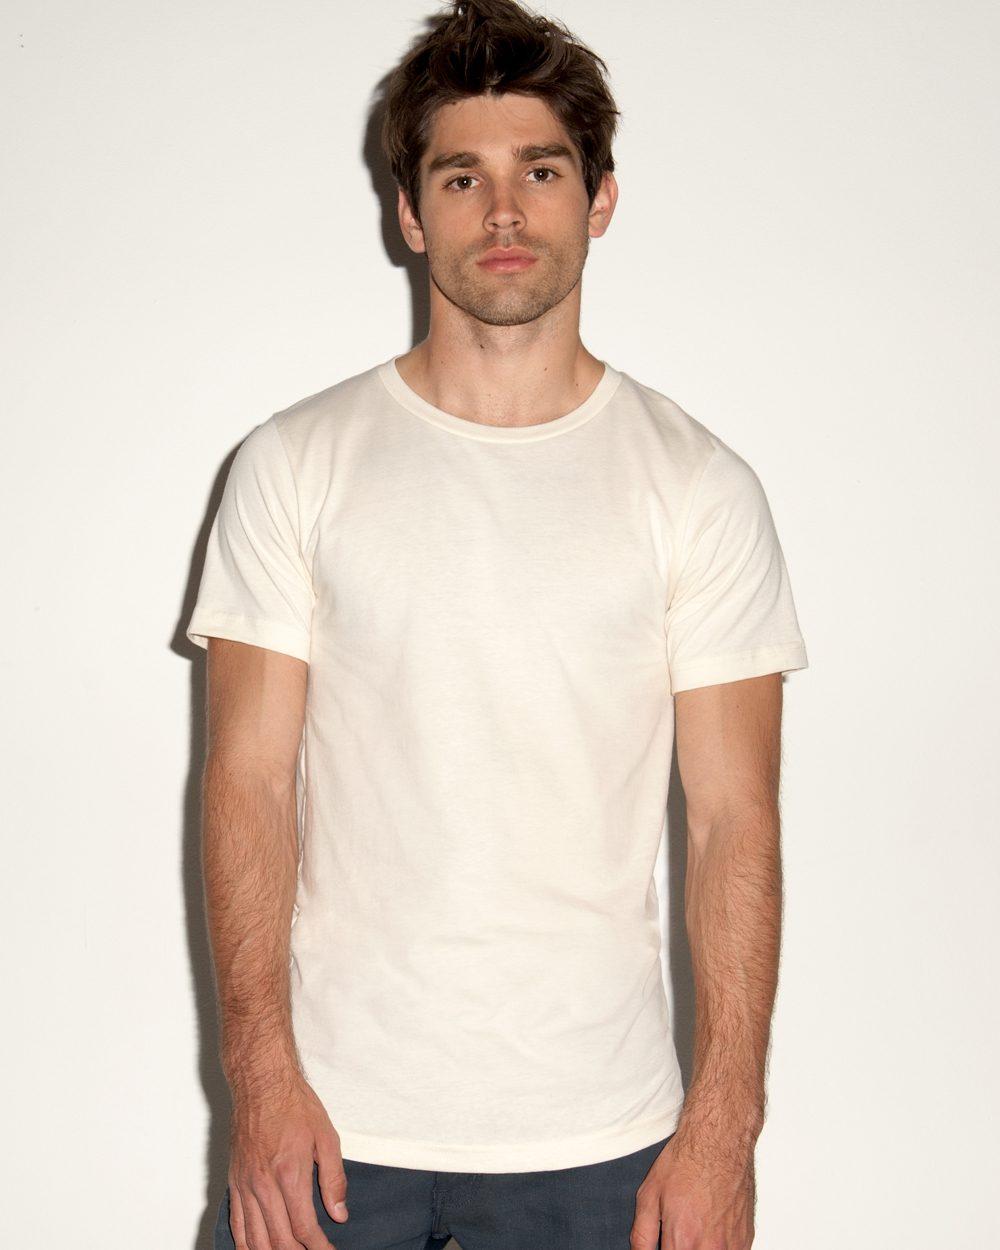 Canvas 3020 Doheny Organic Cotton Short Sleeve T-Shirt